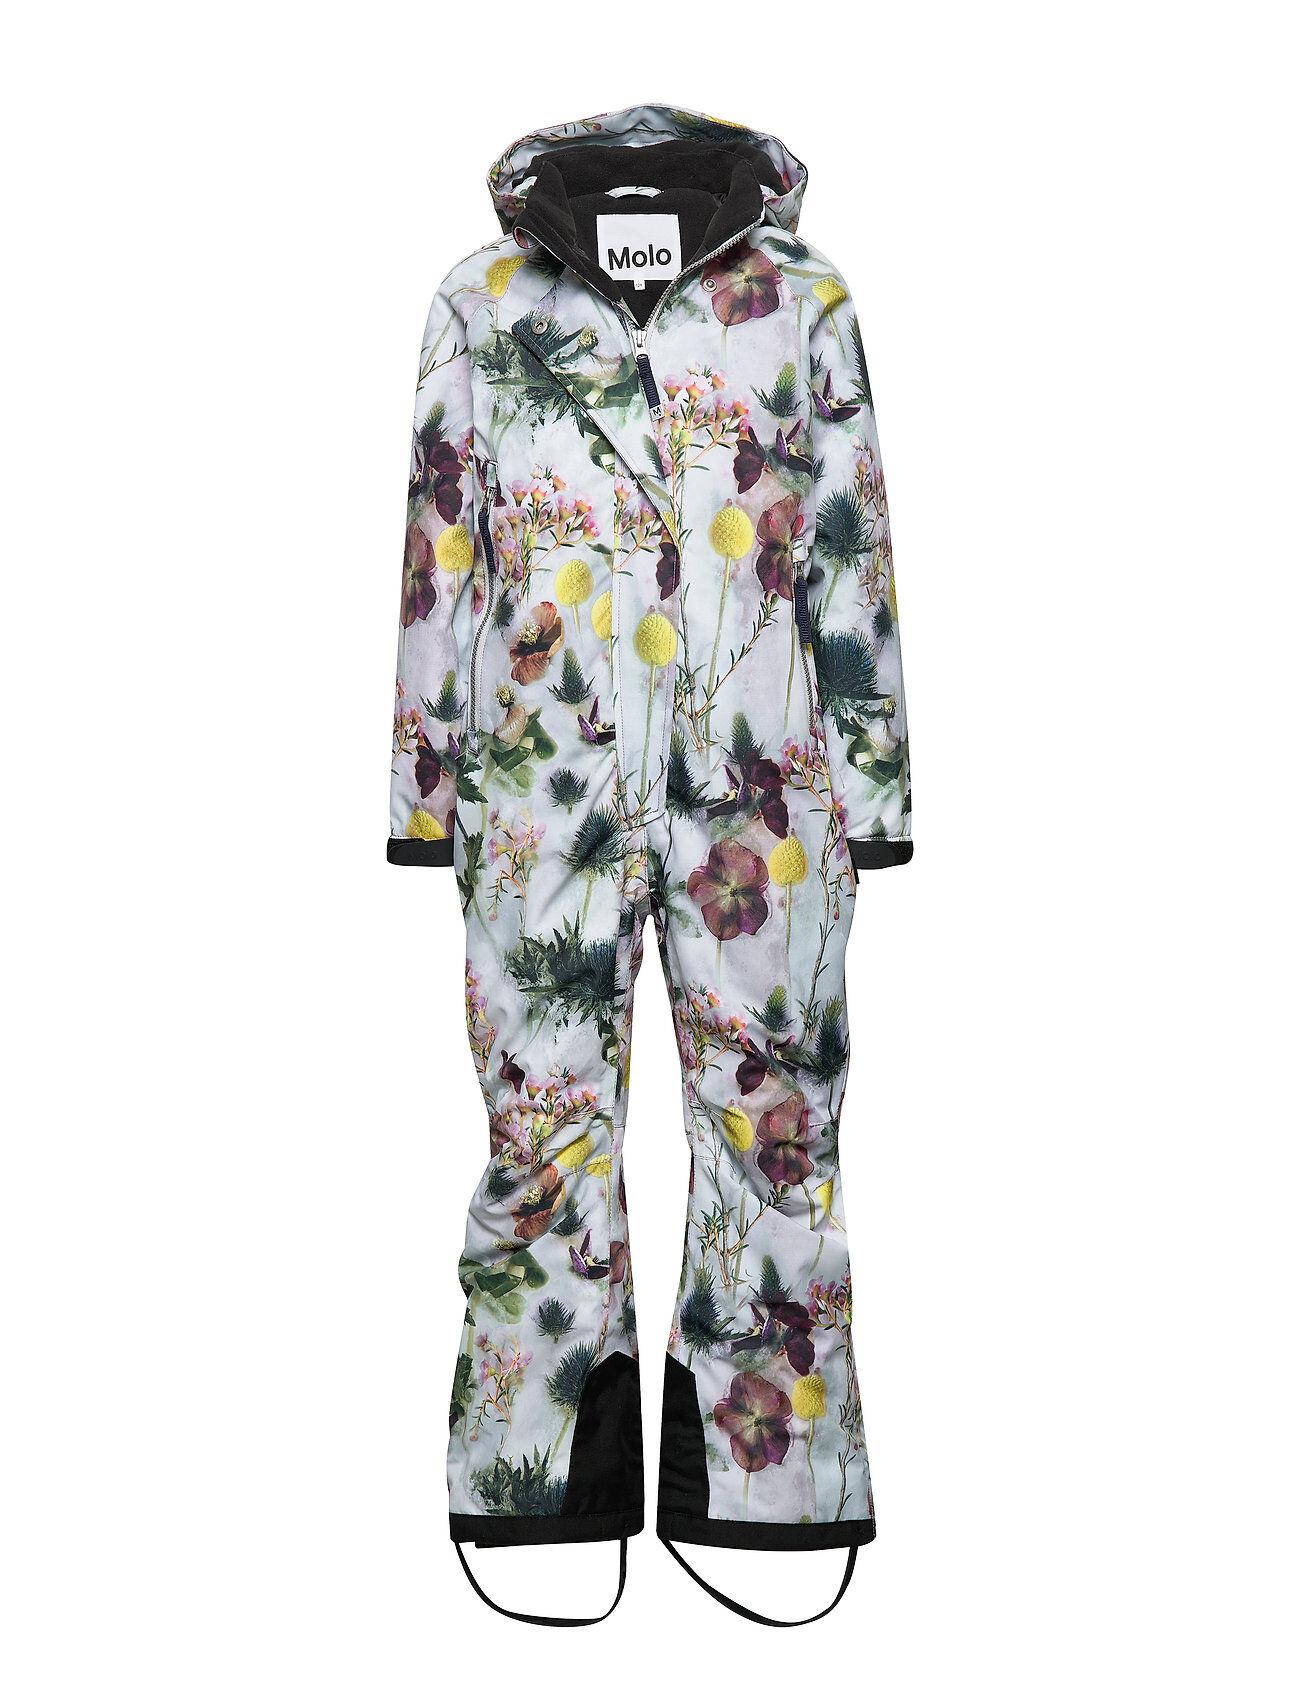 Molo Hux Outerwear Snow/ski Clothing Snow/ski Suits & Sets Monivärinen/Kuvioitu Molo